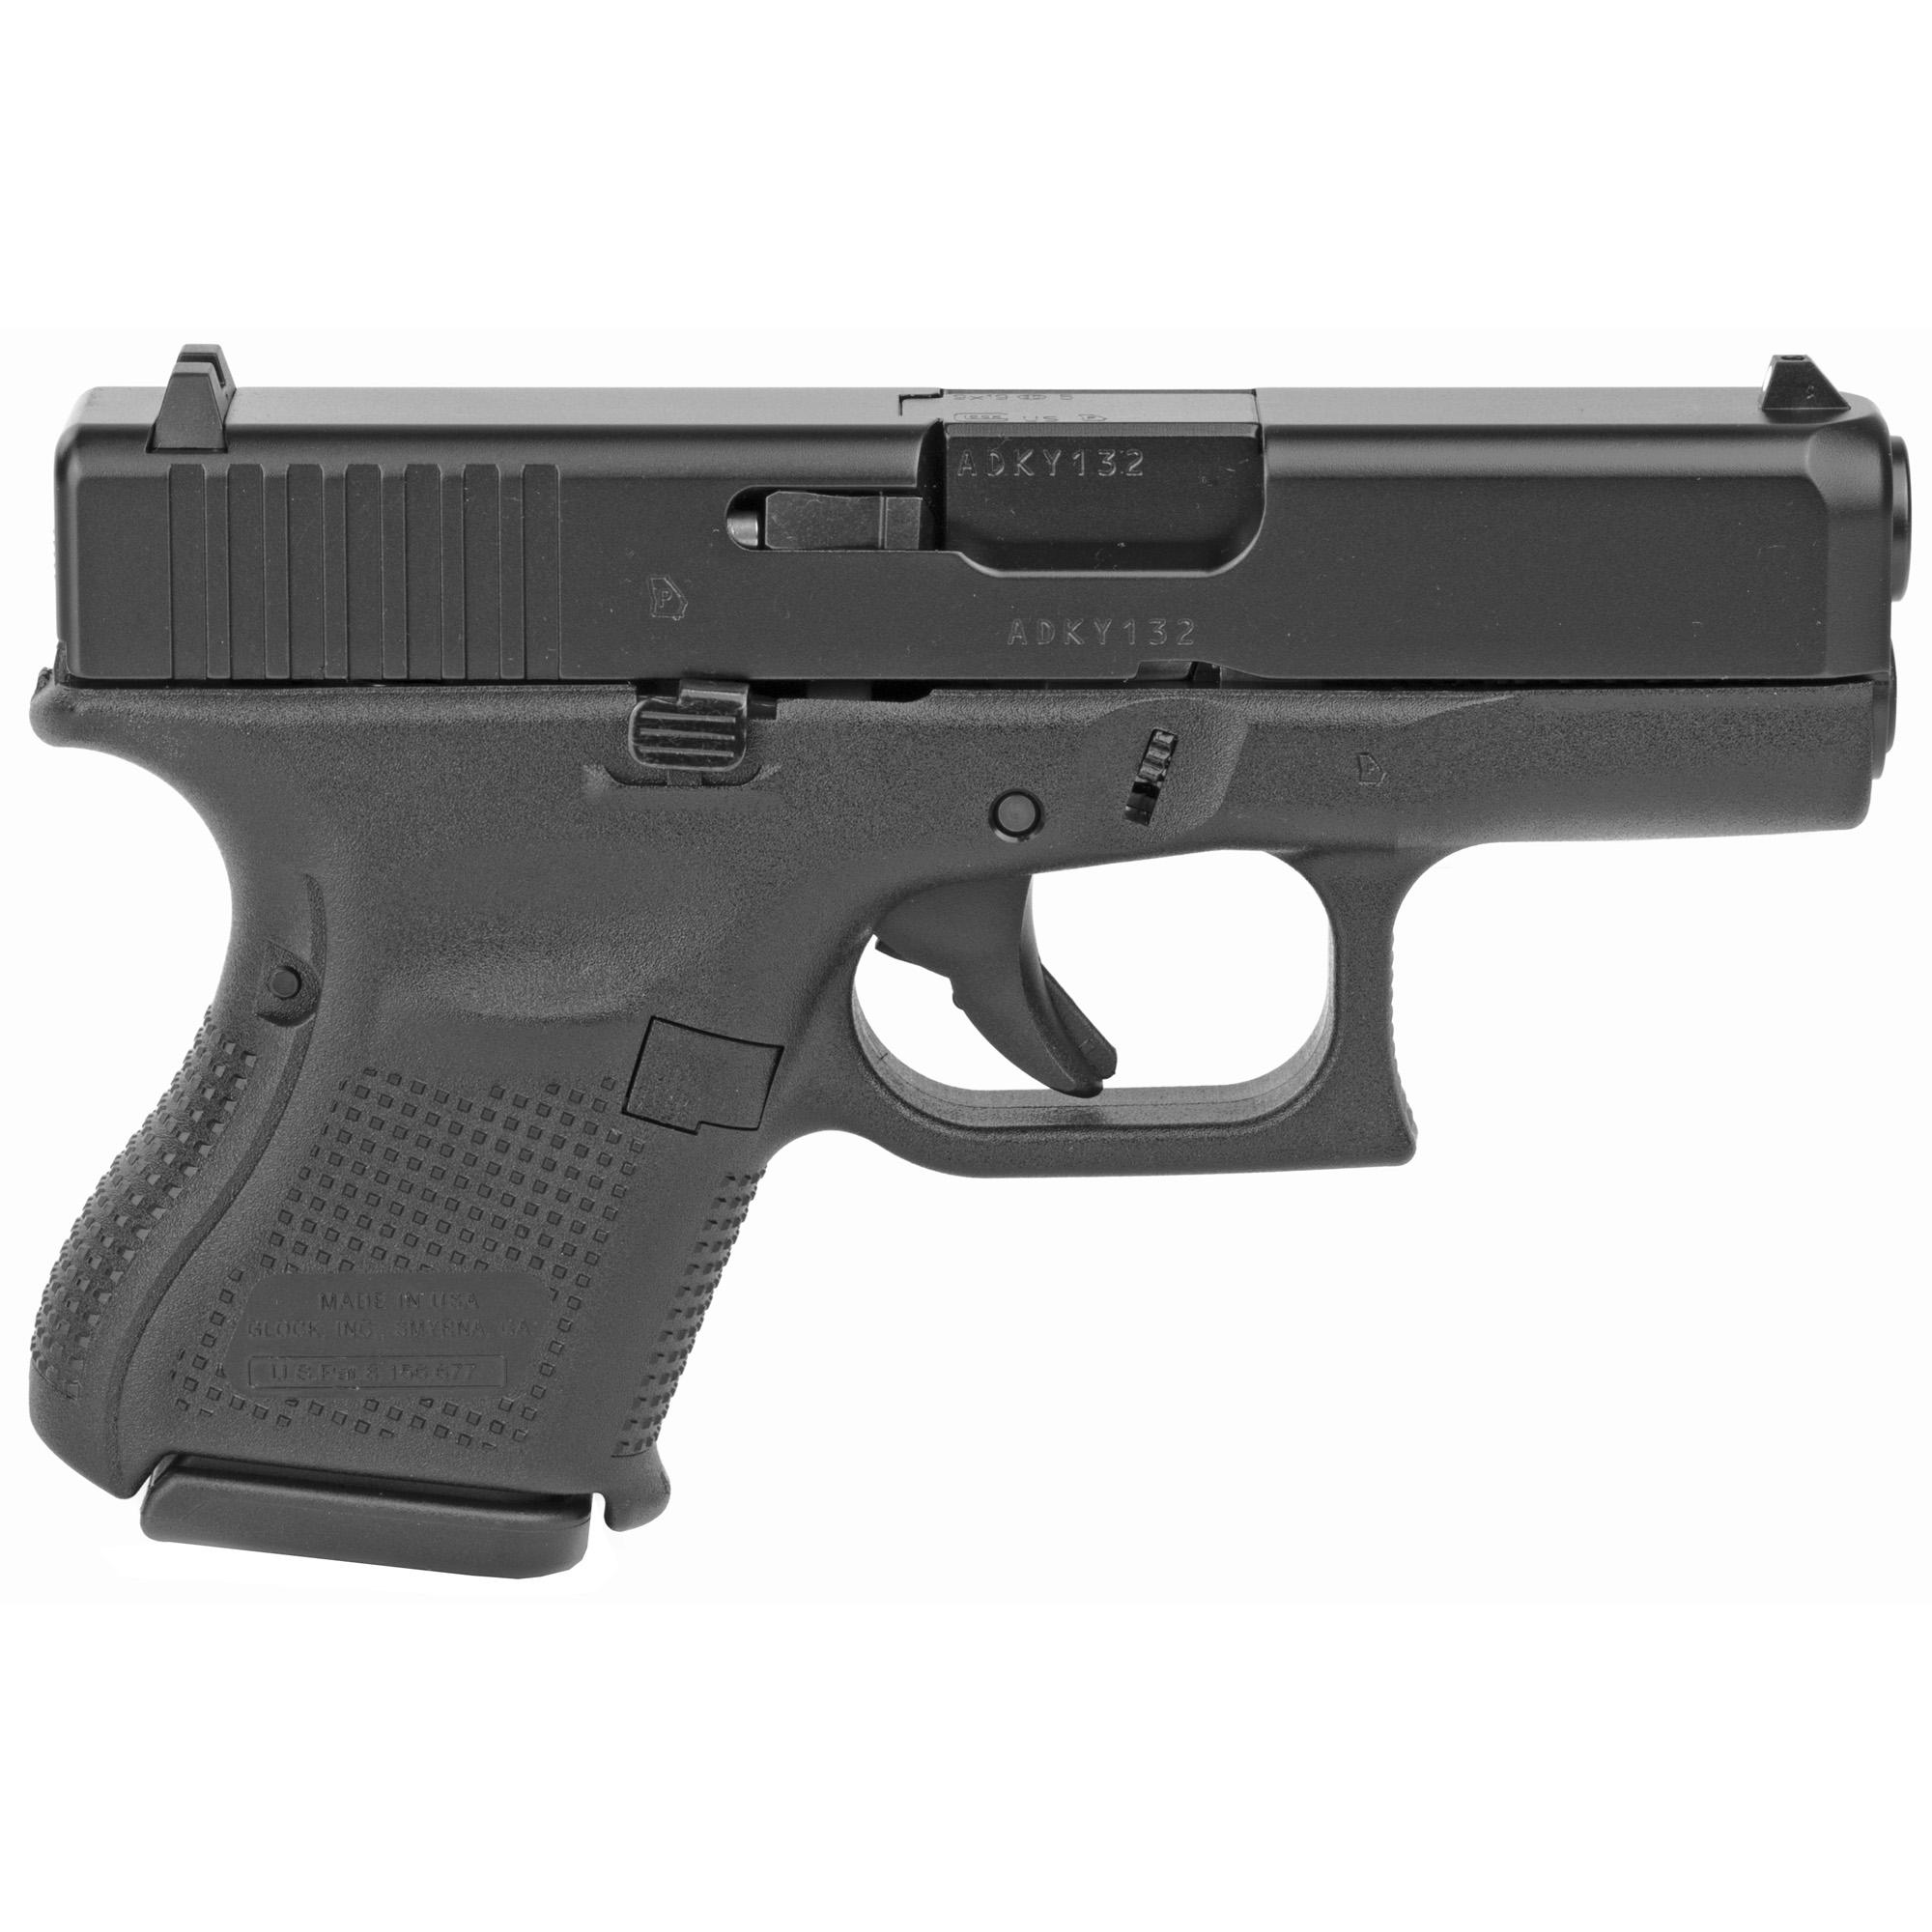 Glock 26 GEN 5 9mm - BLACK - U.S. MADE